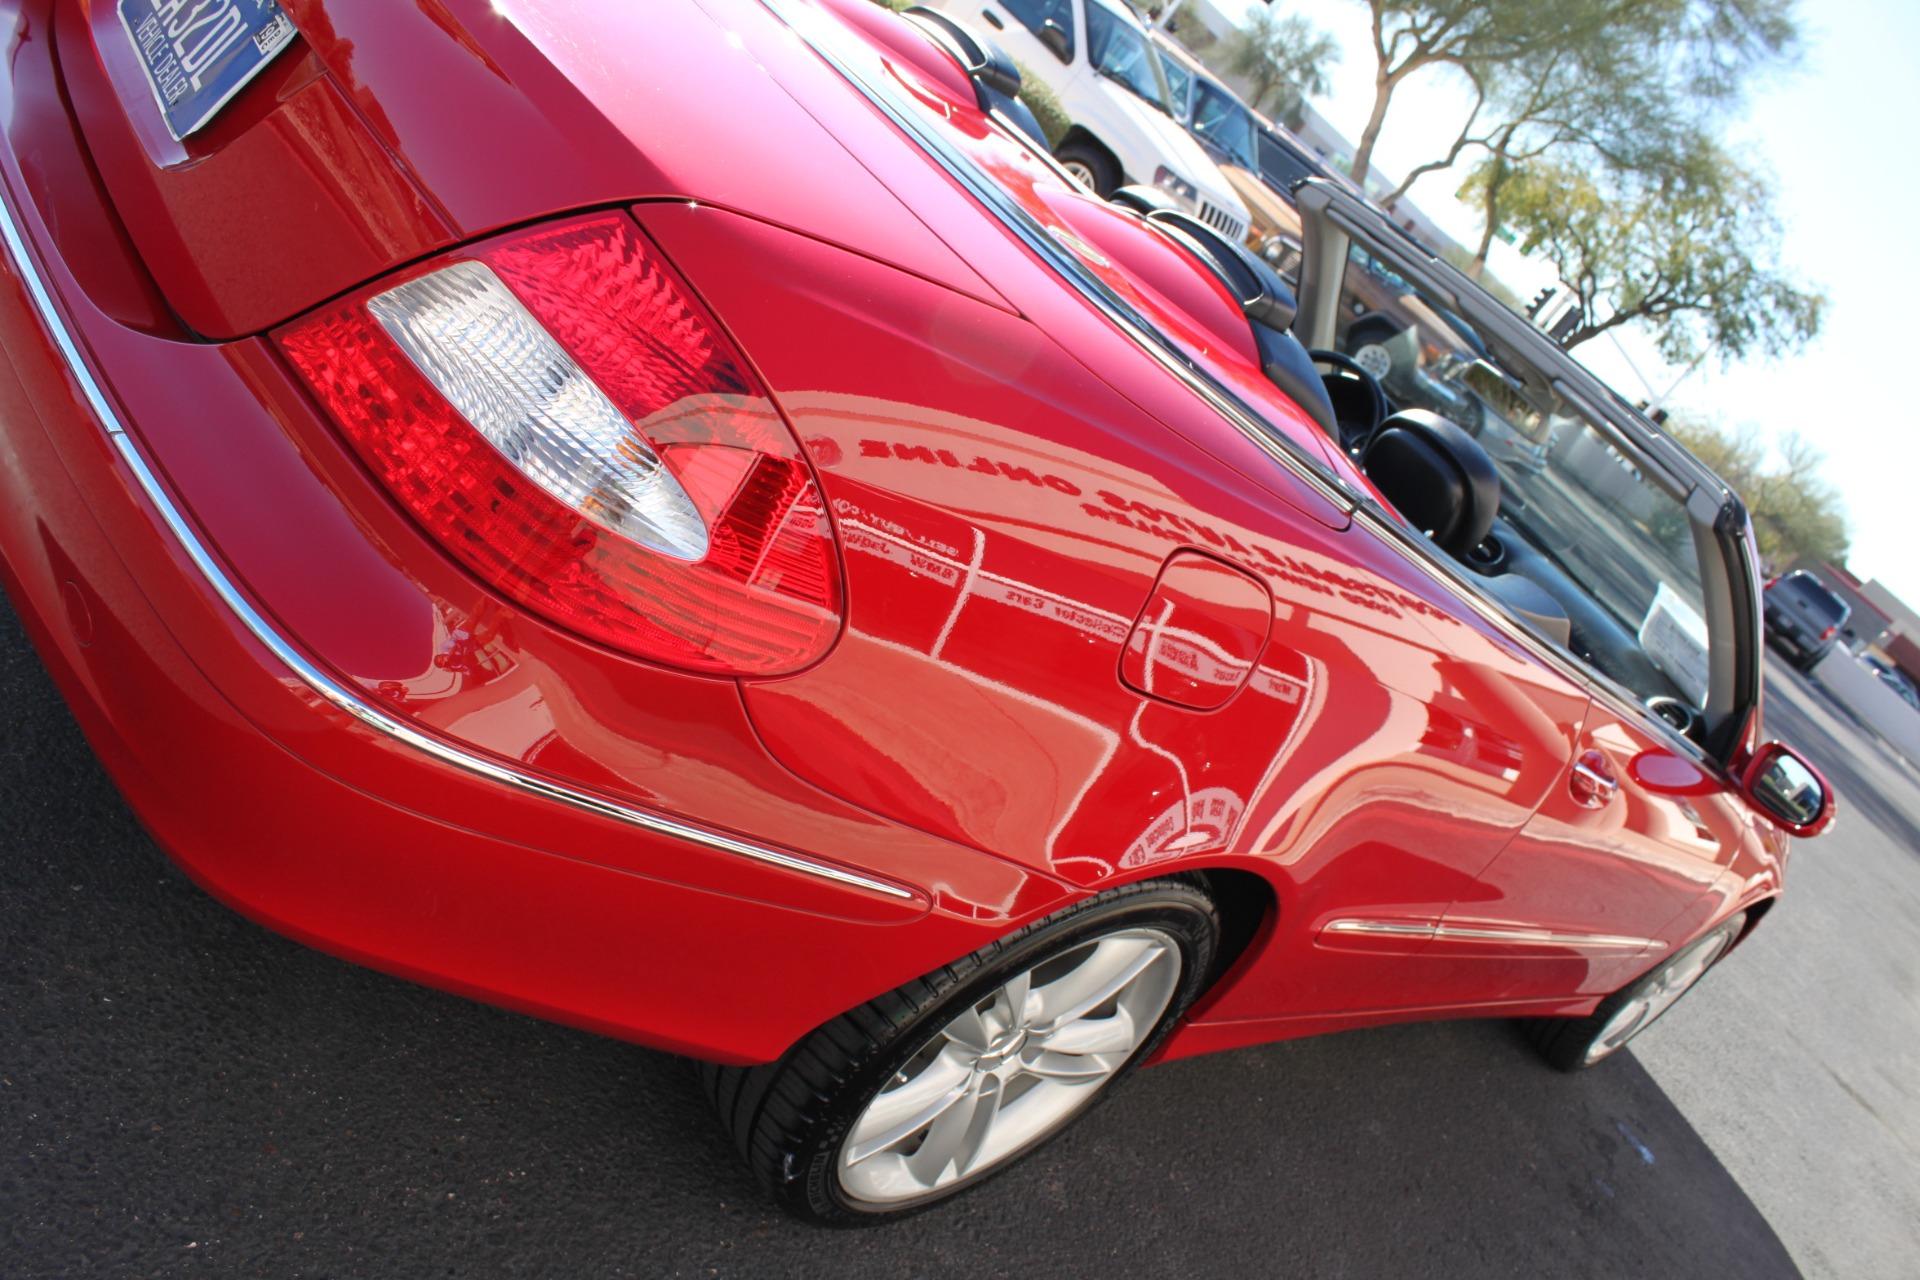 Used-2006-Mercedes-Benz-CLK-Class-Convertible-35L-Audi